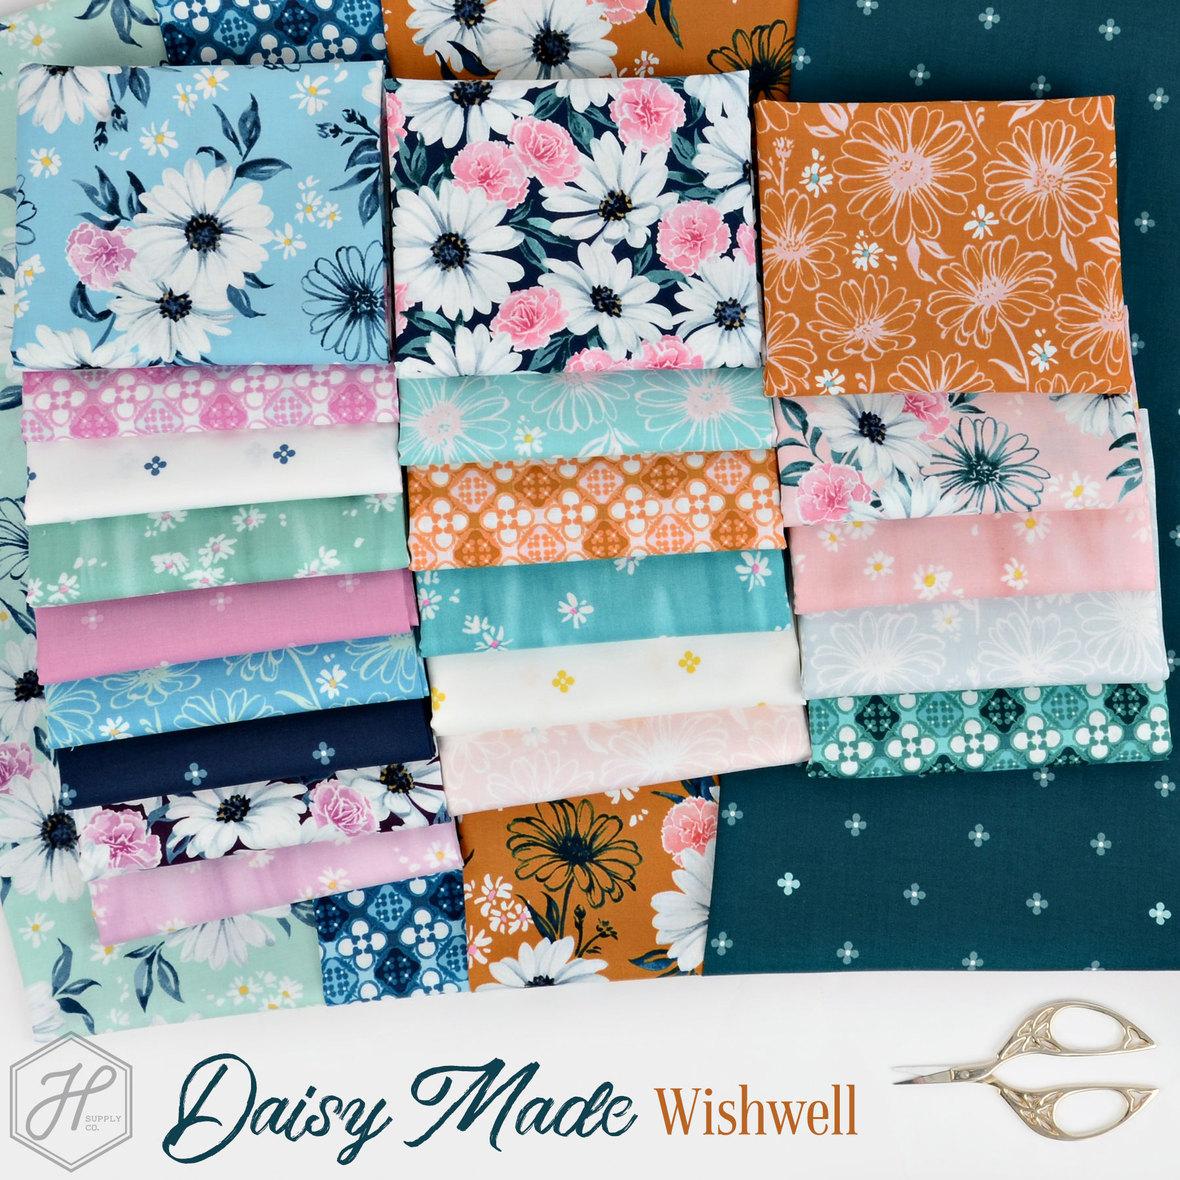 Daisy-Made-Fabric-Poster-Robert-Kaufman-at-Hawthorne-Supply-Co.